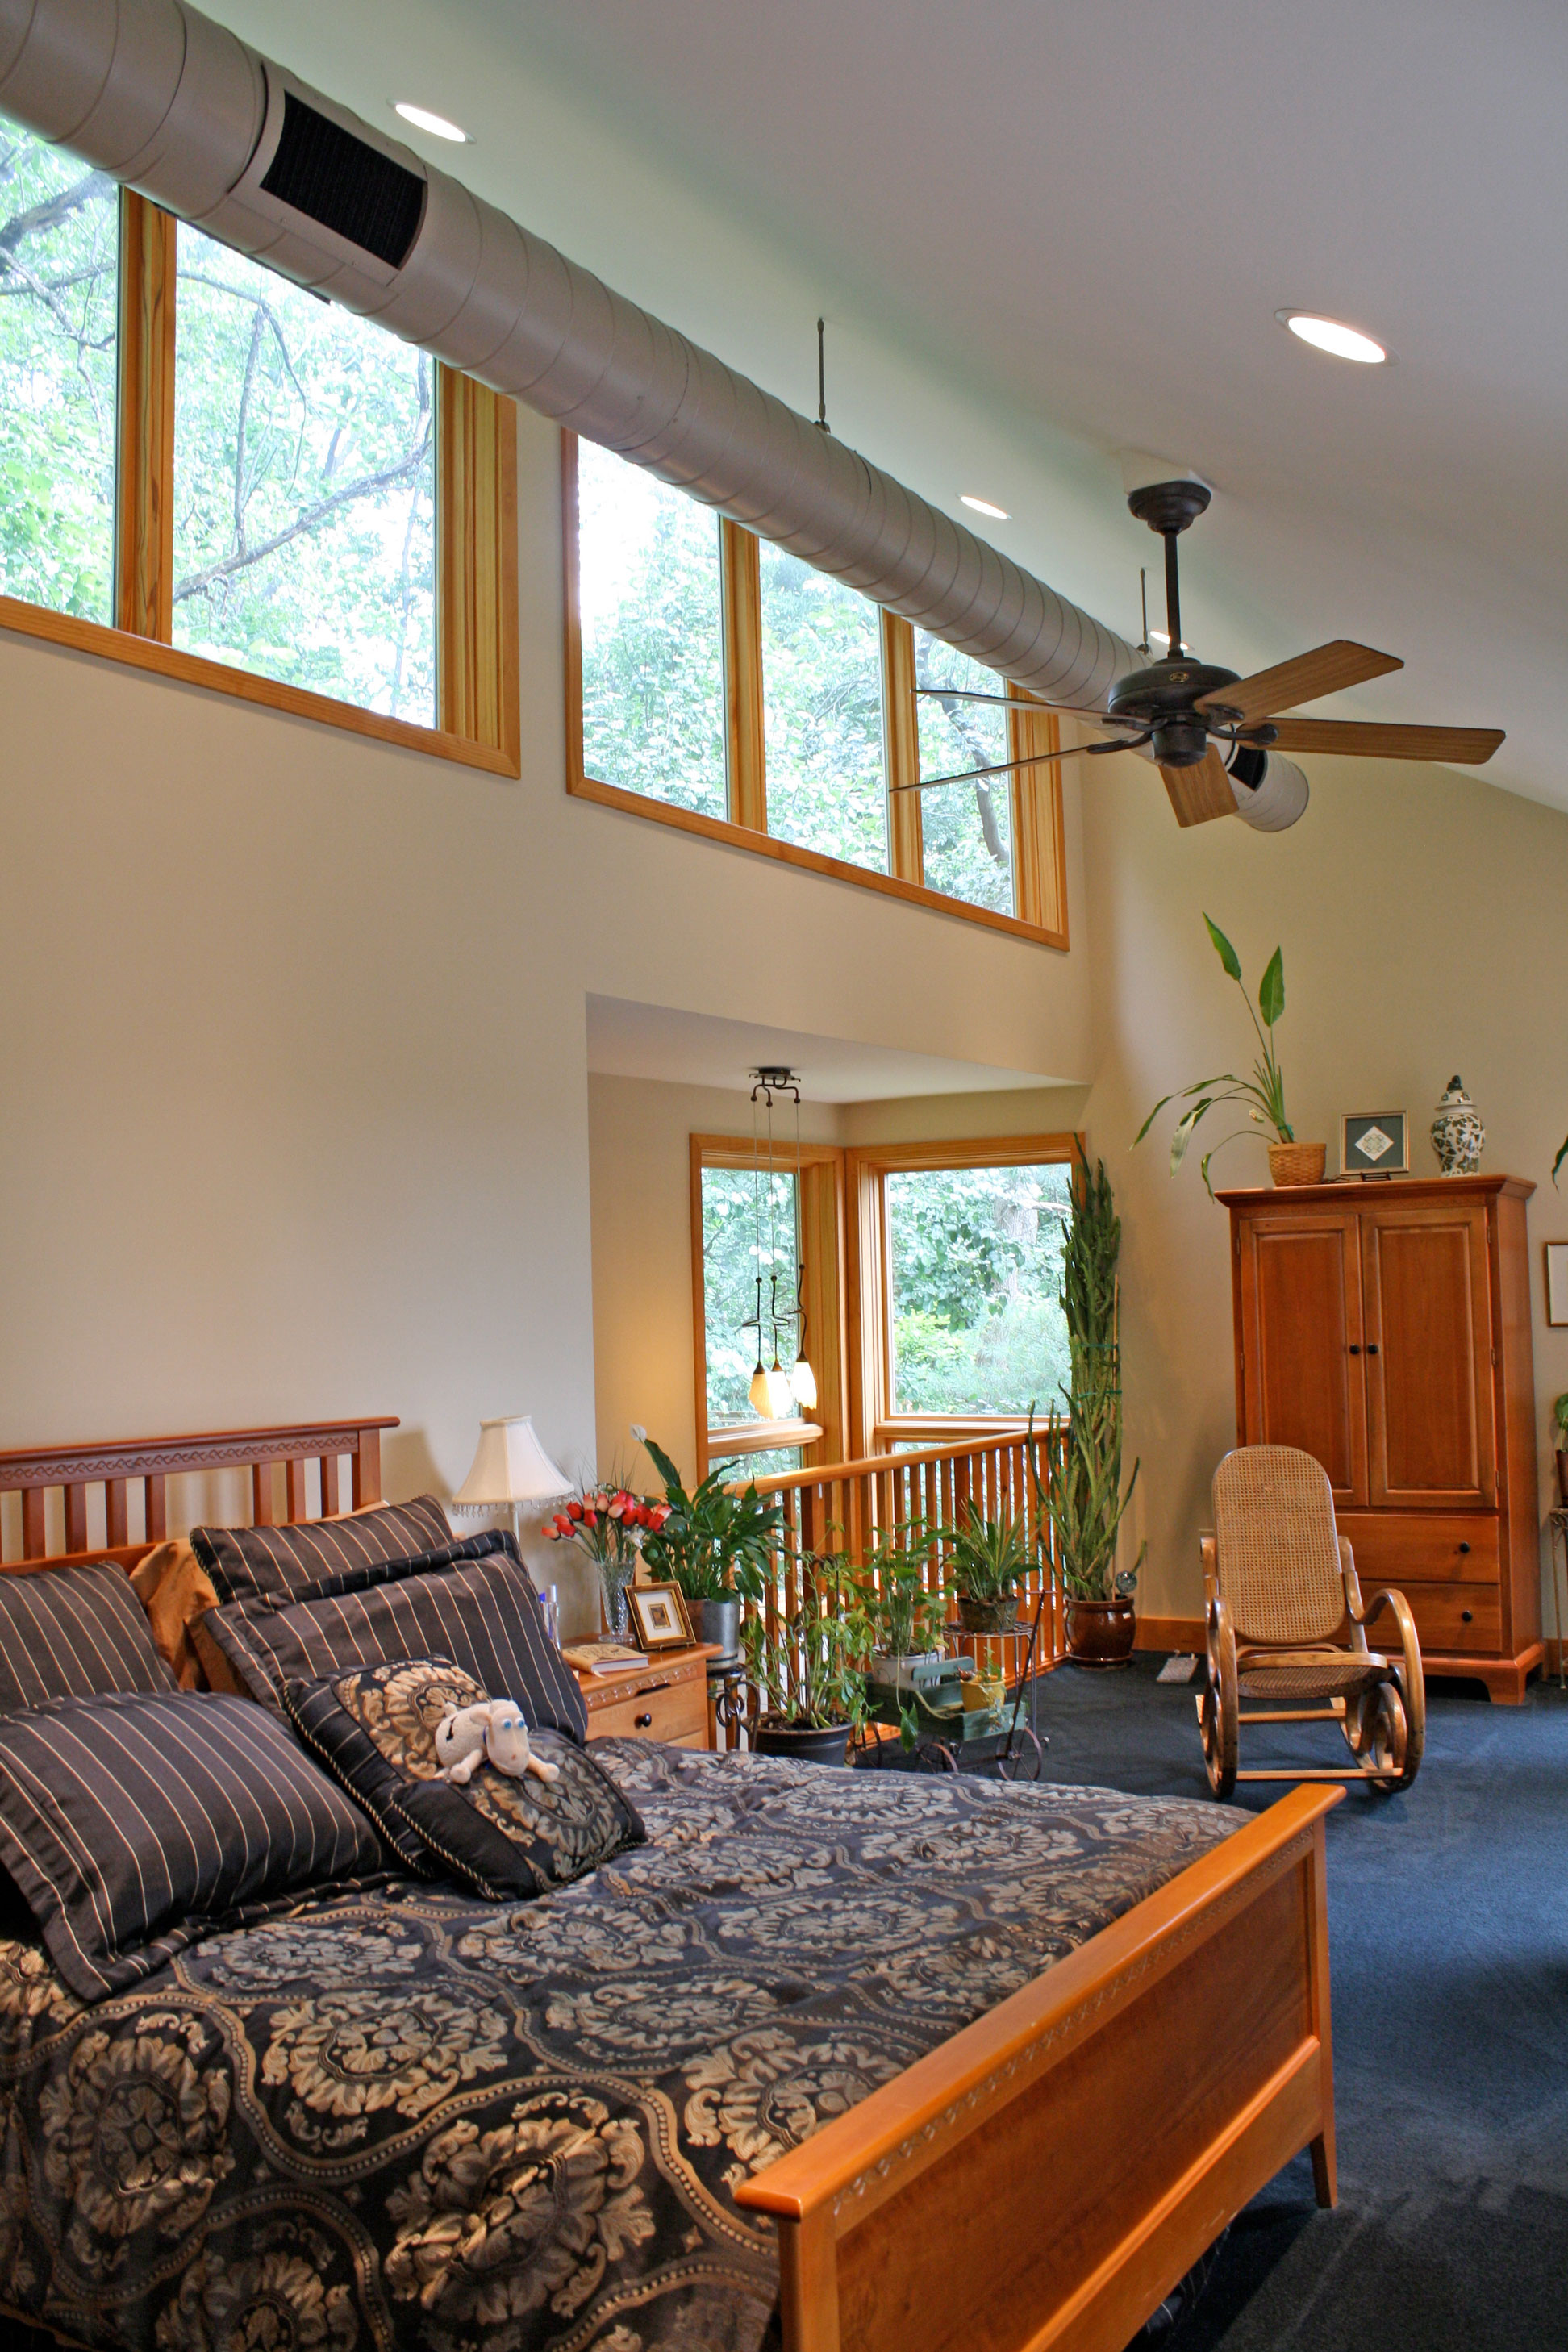 bedroom-large-windows.jpg